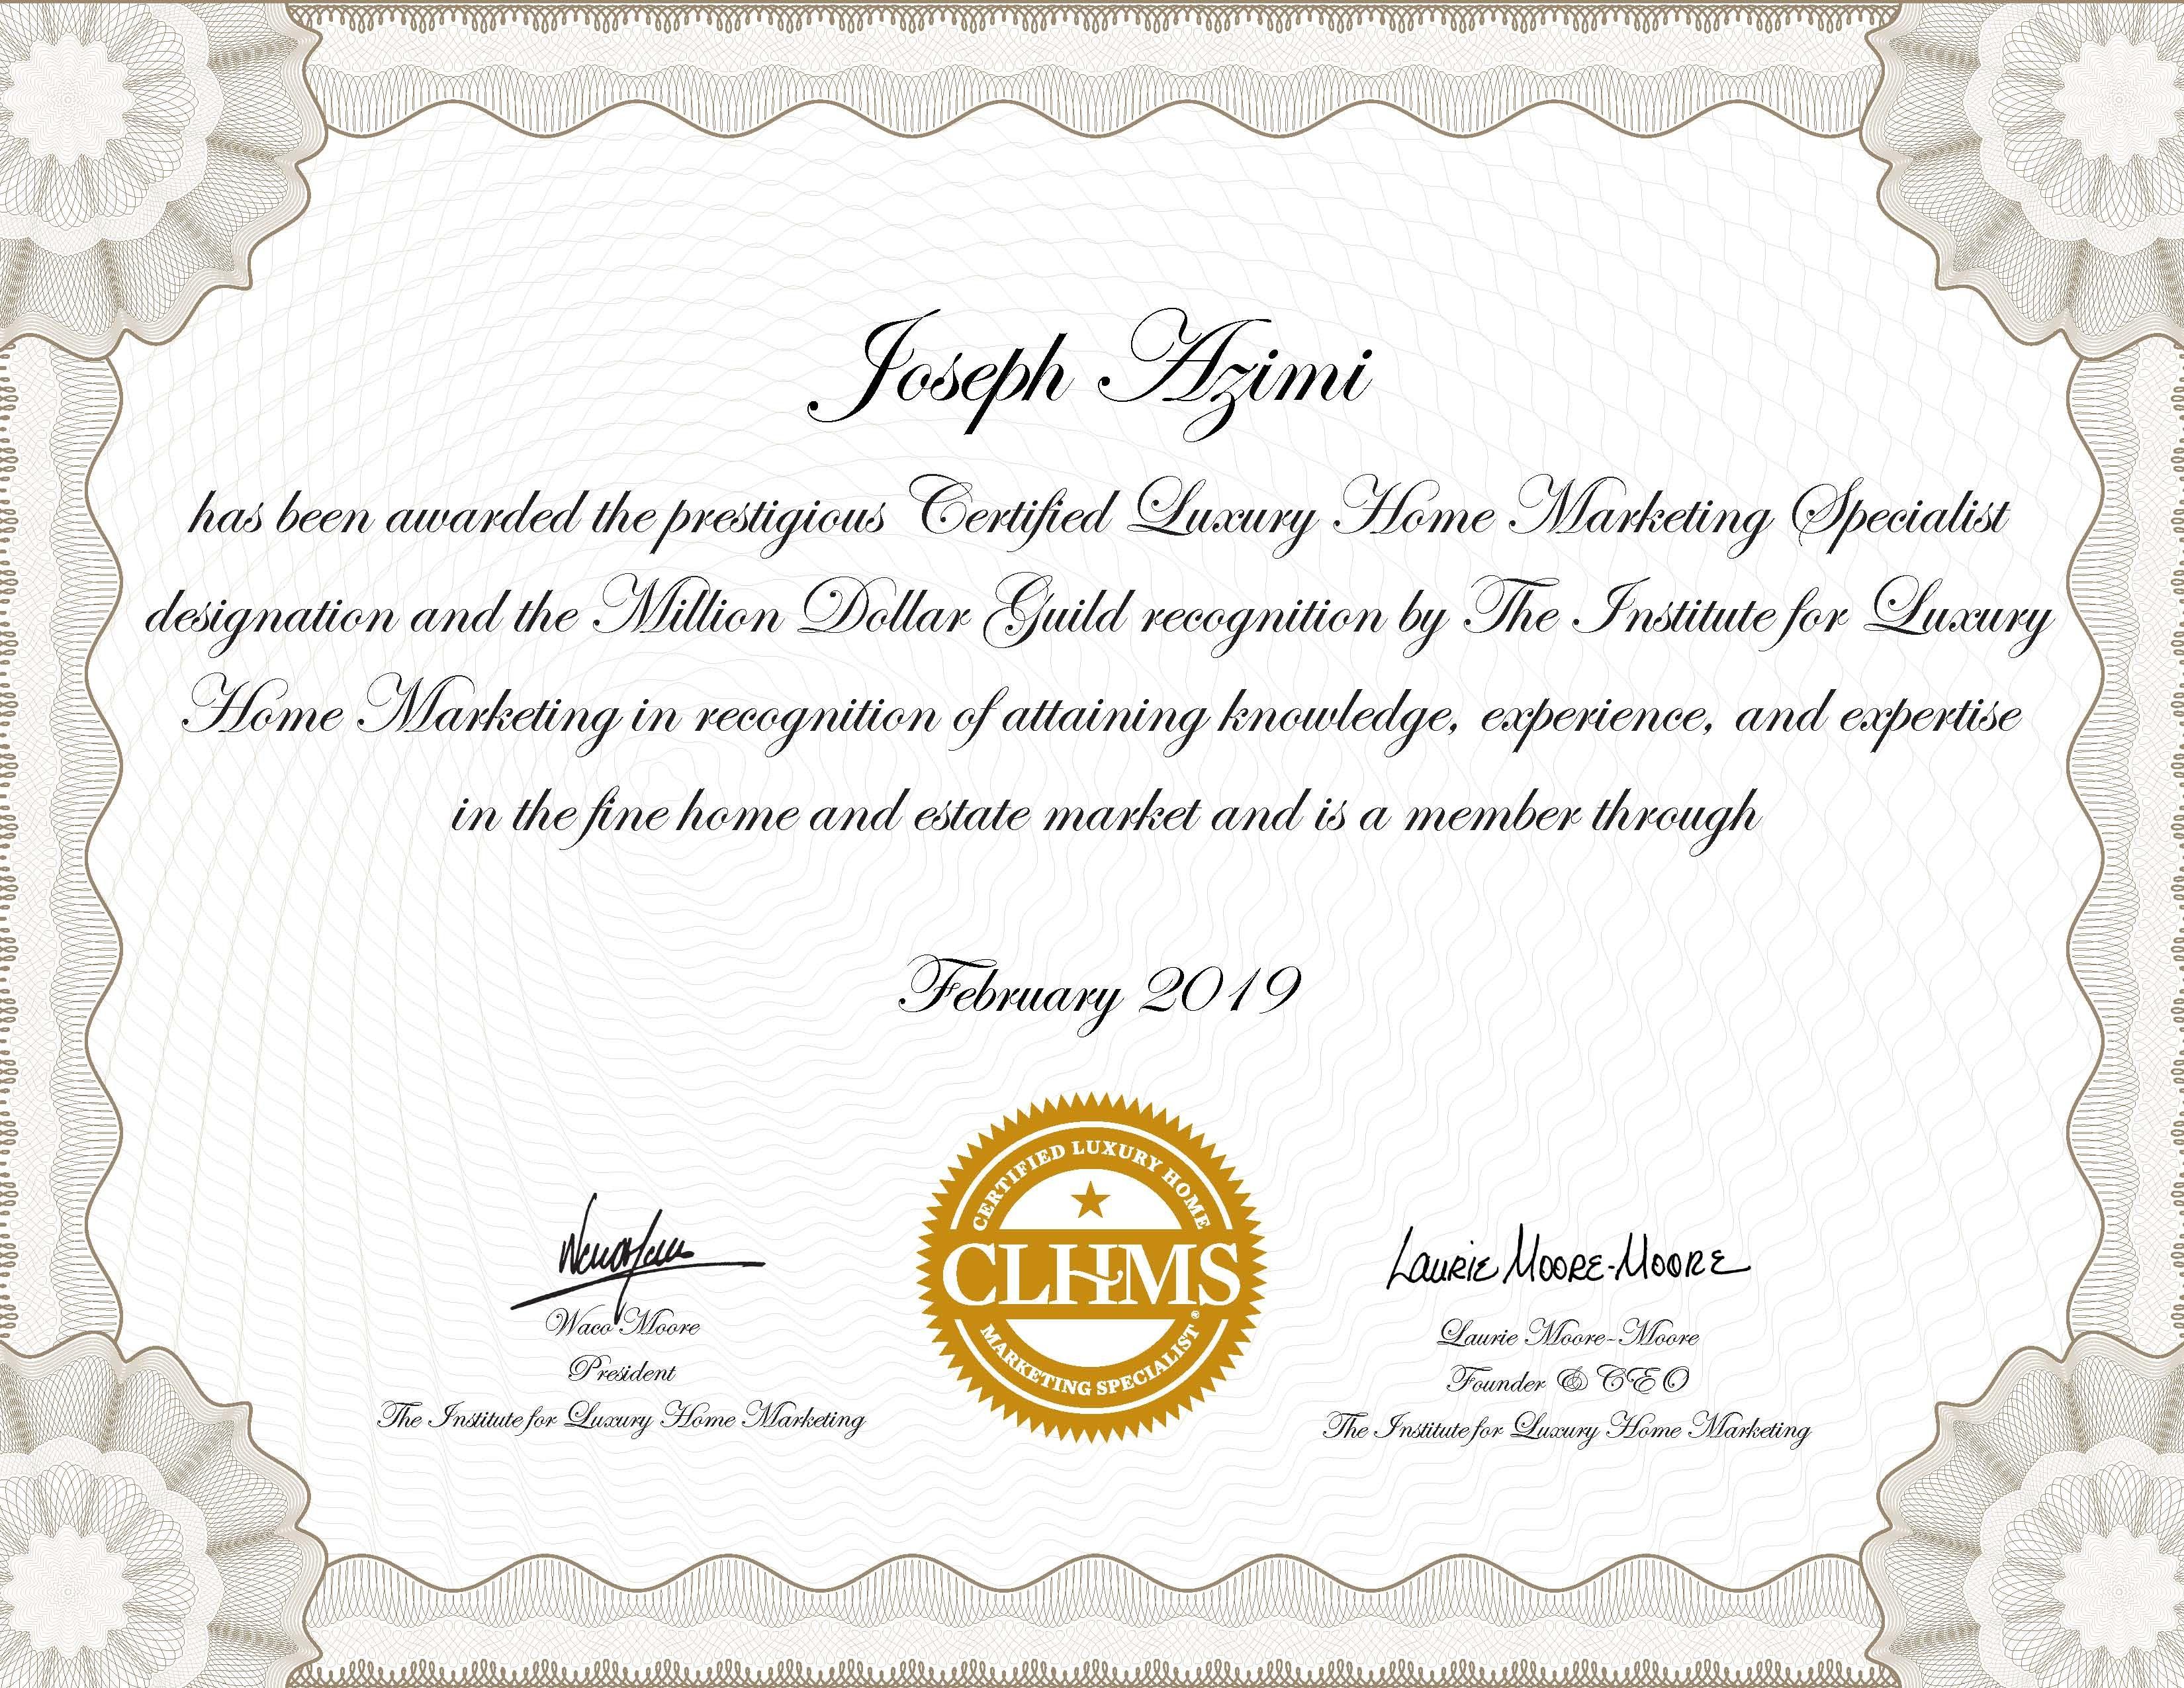 Beau CLHMS   JOSEPH AZIMI CERTIFIED LUXURY HOME MARKETING SPECIALIST IN ONTARIO,  TORONTO, VAUGHAN,